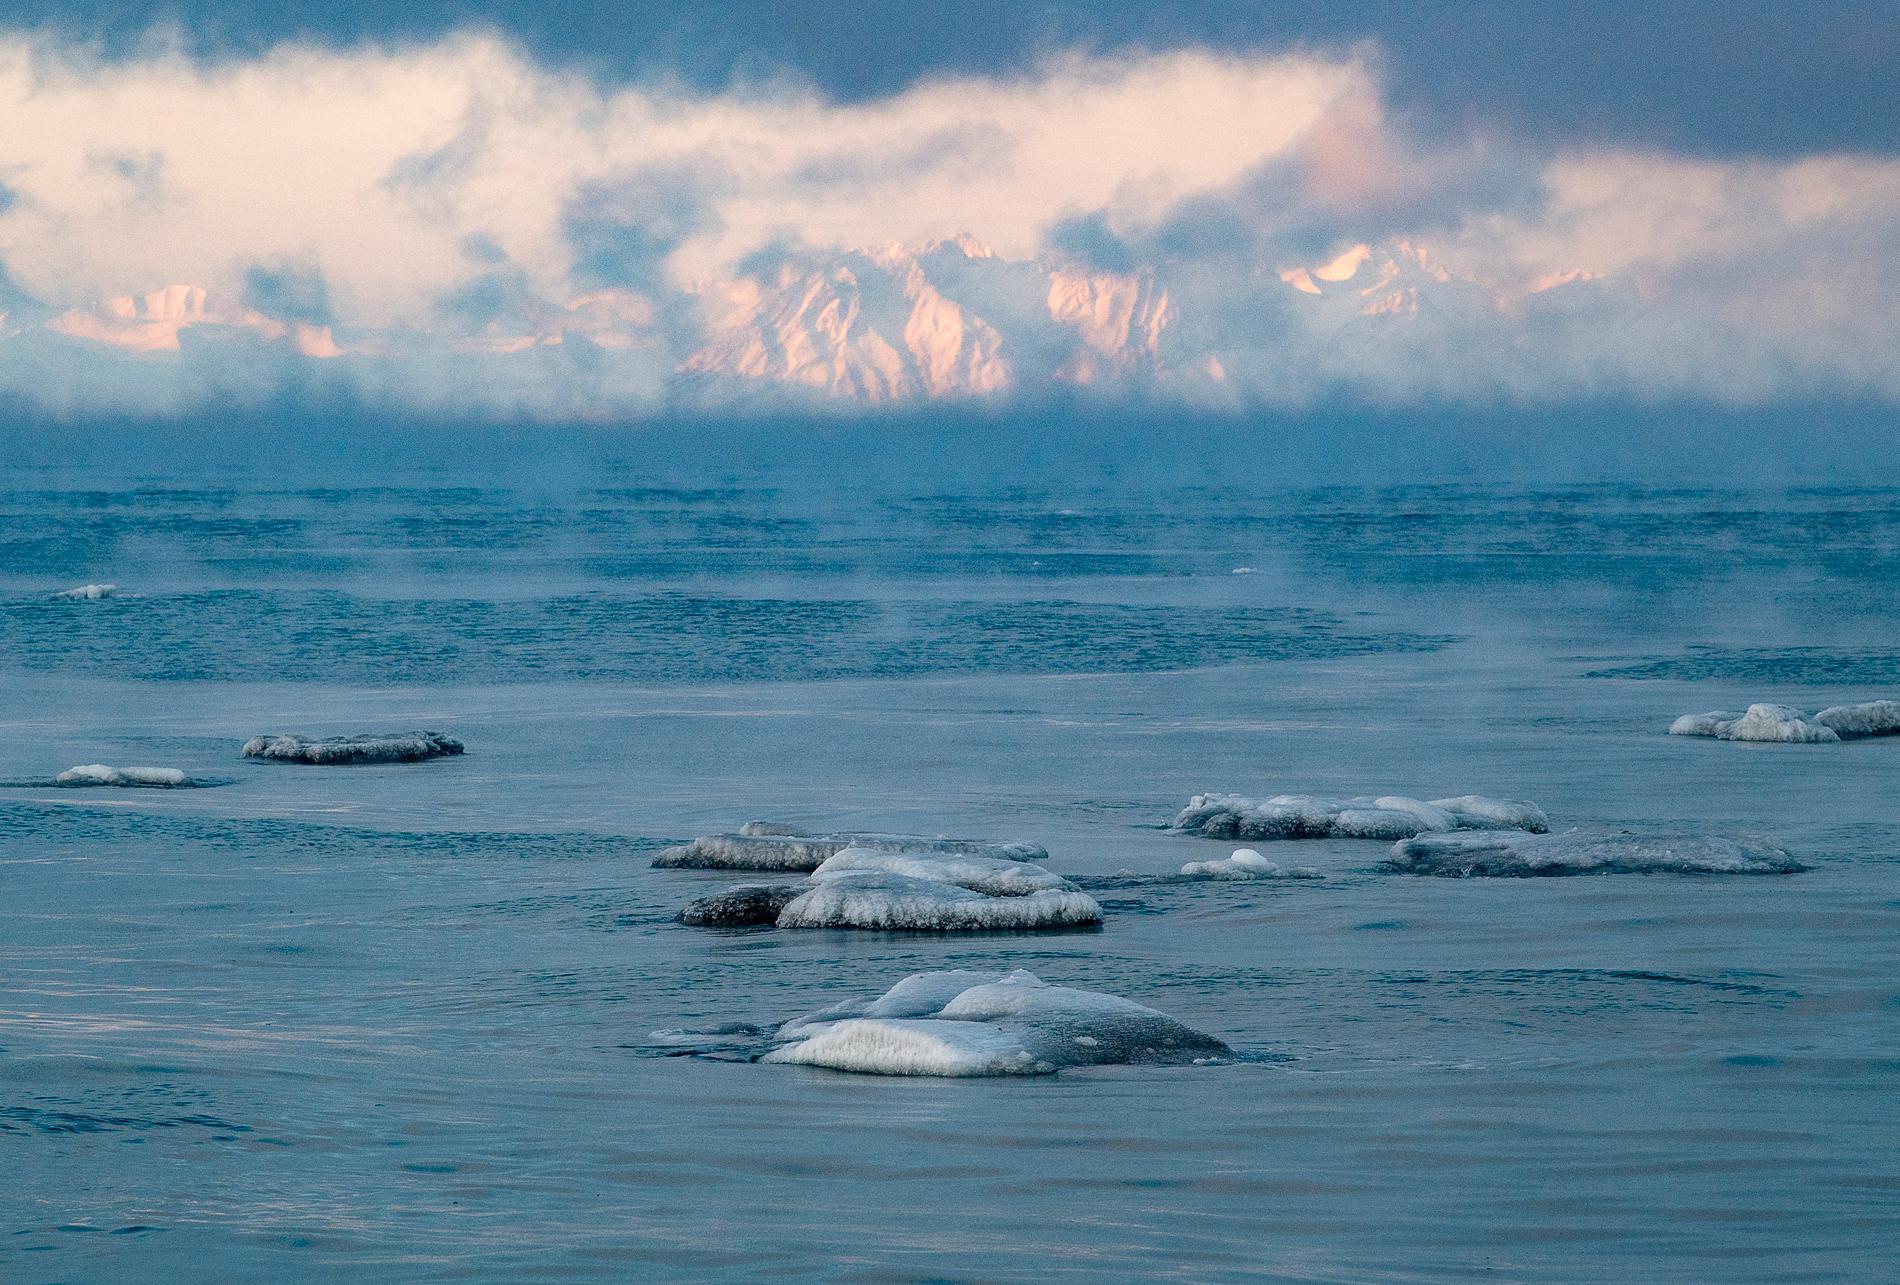 Arktis isar smälter.